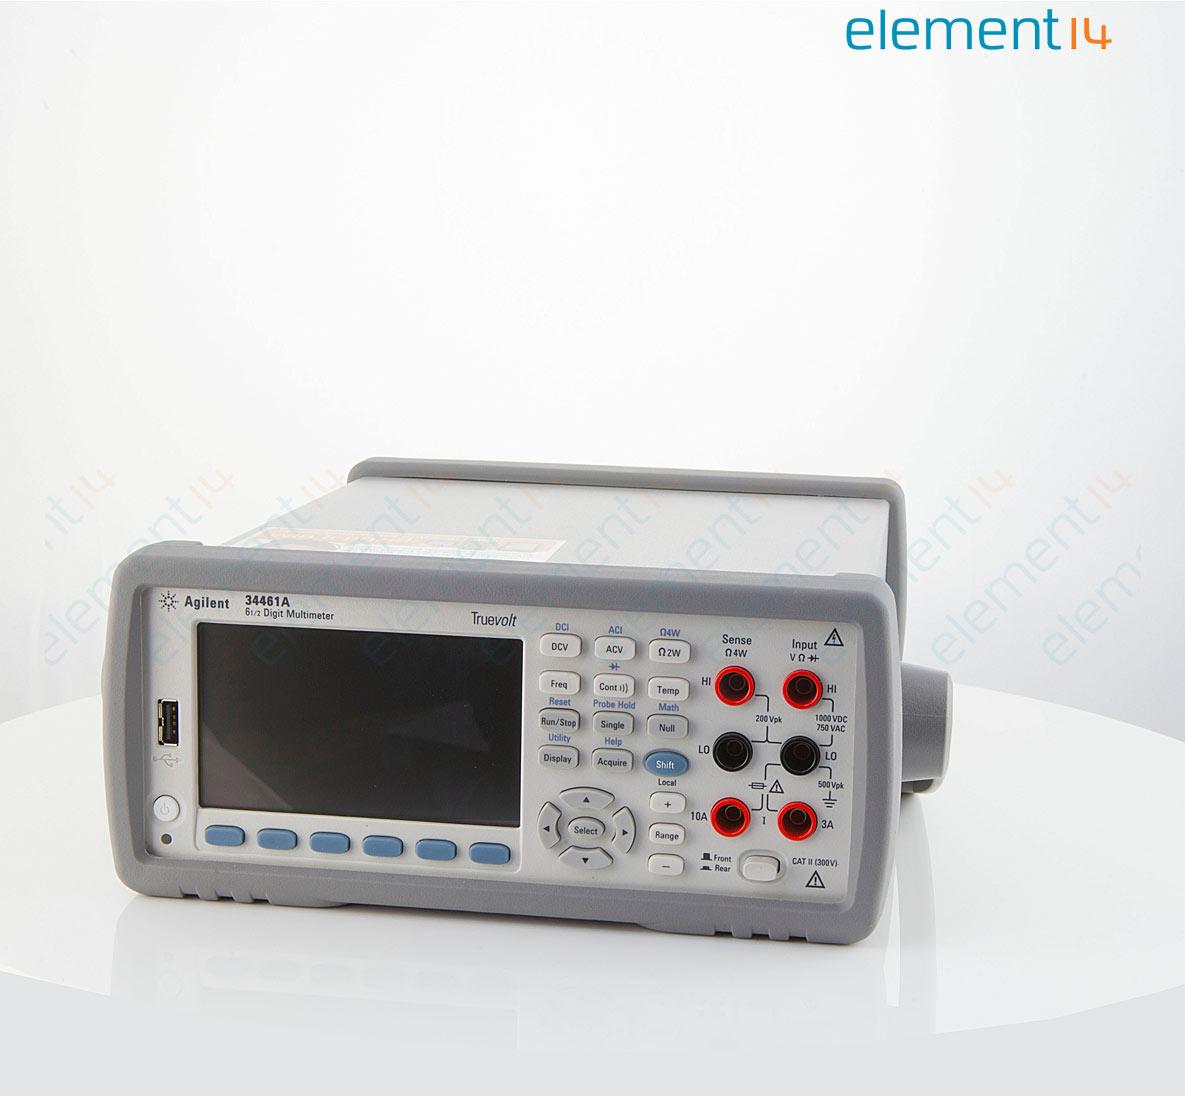 34461a Keysight Technologies Bench Digital Multimeter Truevolt Quot Stereo Phone Plug Further Circuit Diagram Richmedia 9400b En